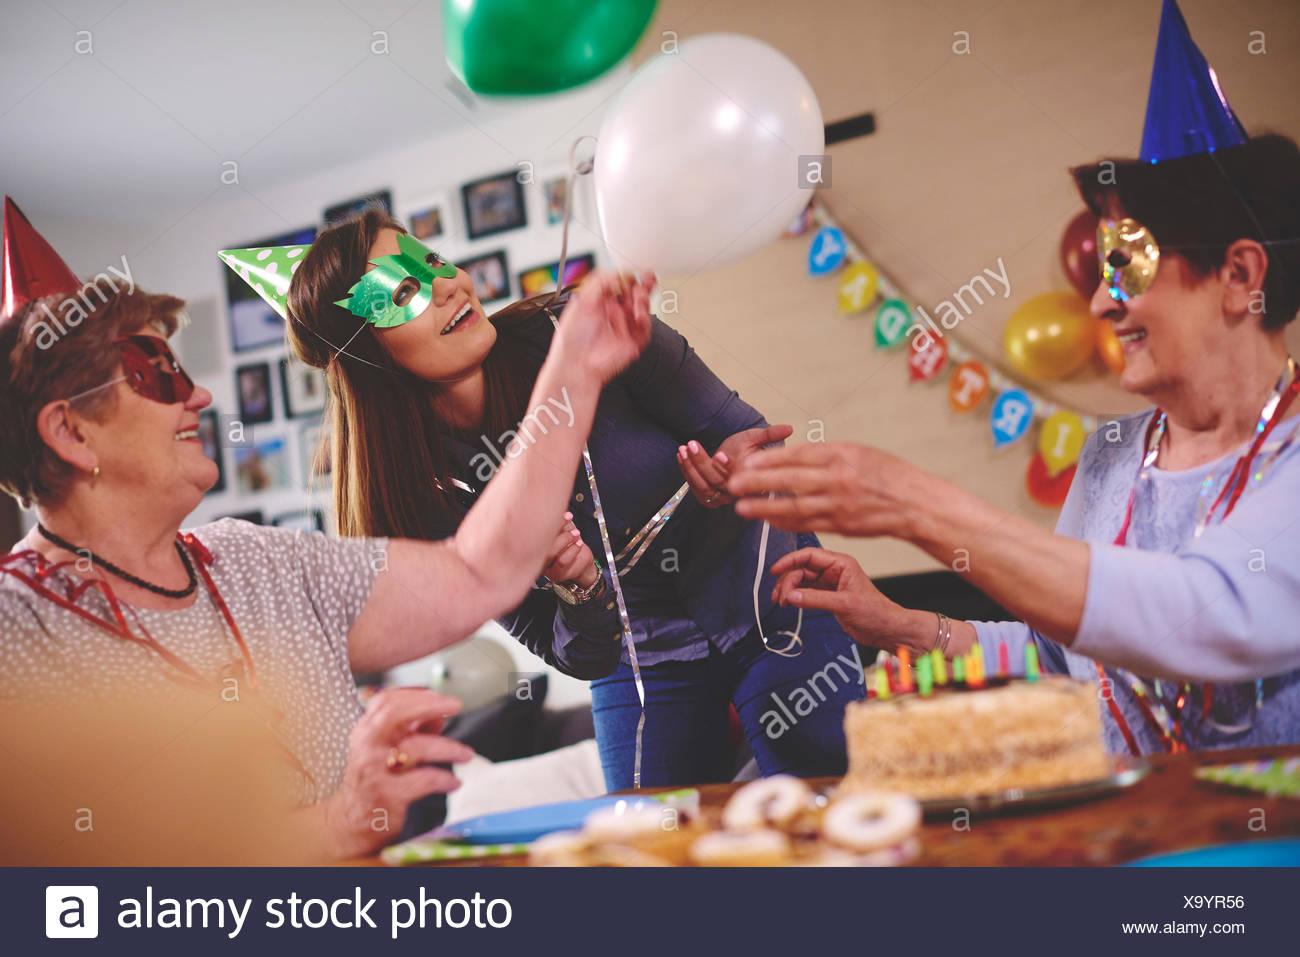 Senior women waving balloons at birthday party - Stock Image